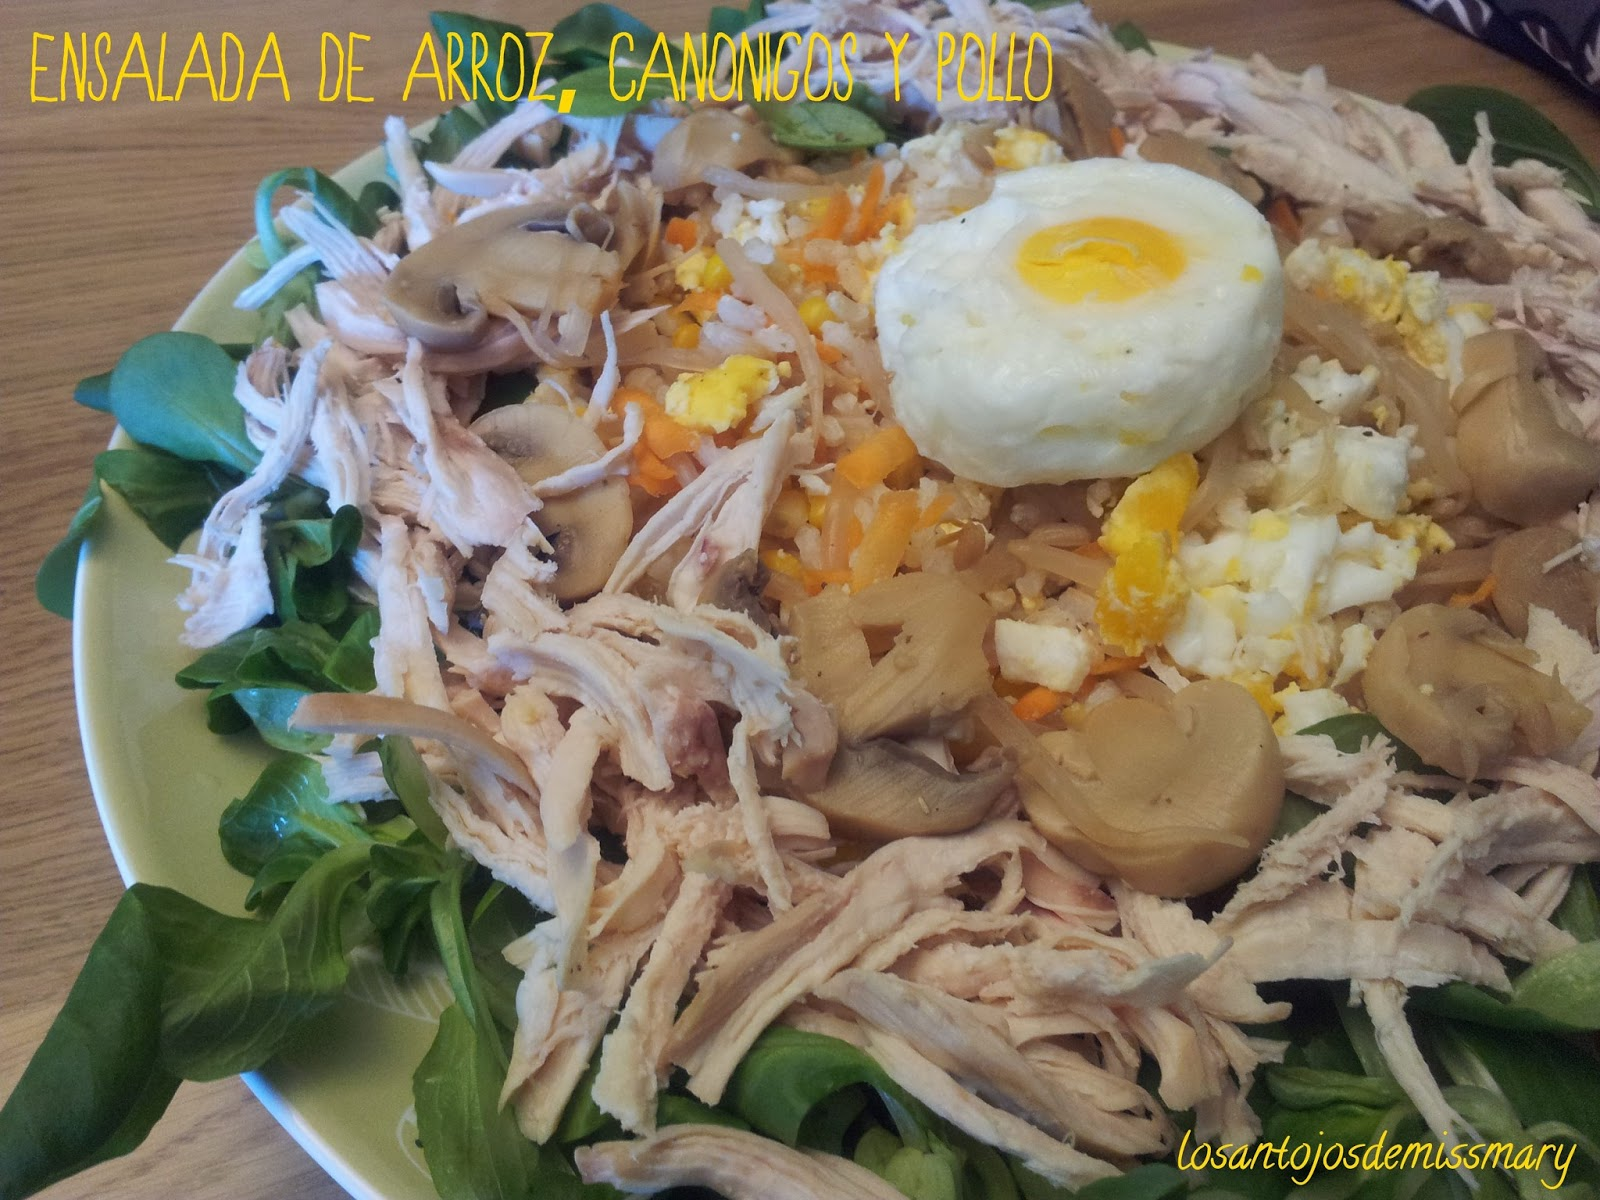 Los antojos de miss mary ensalada de arroz integral - Ensalada de arroz light ...